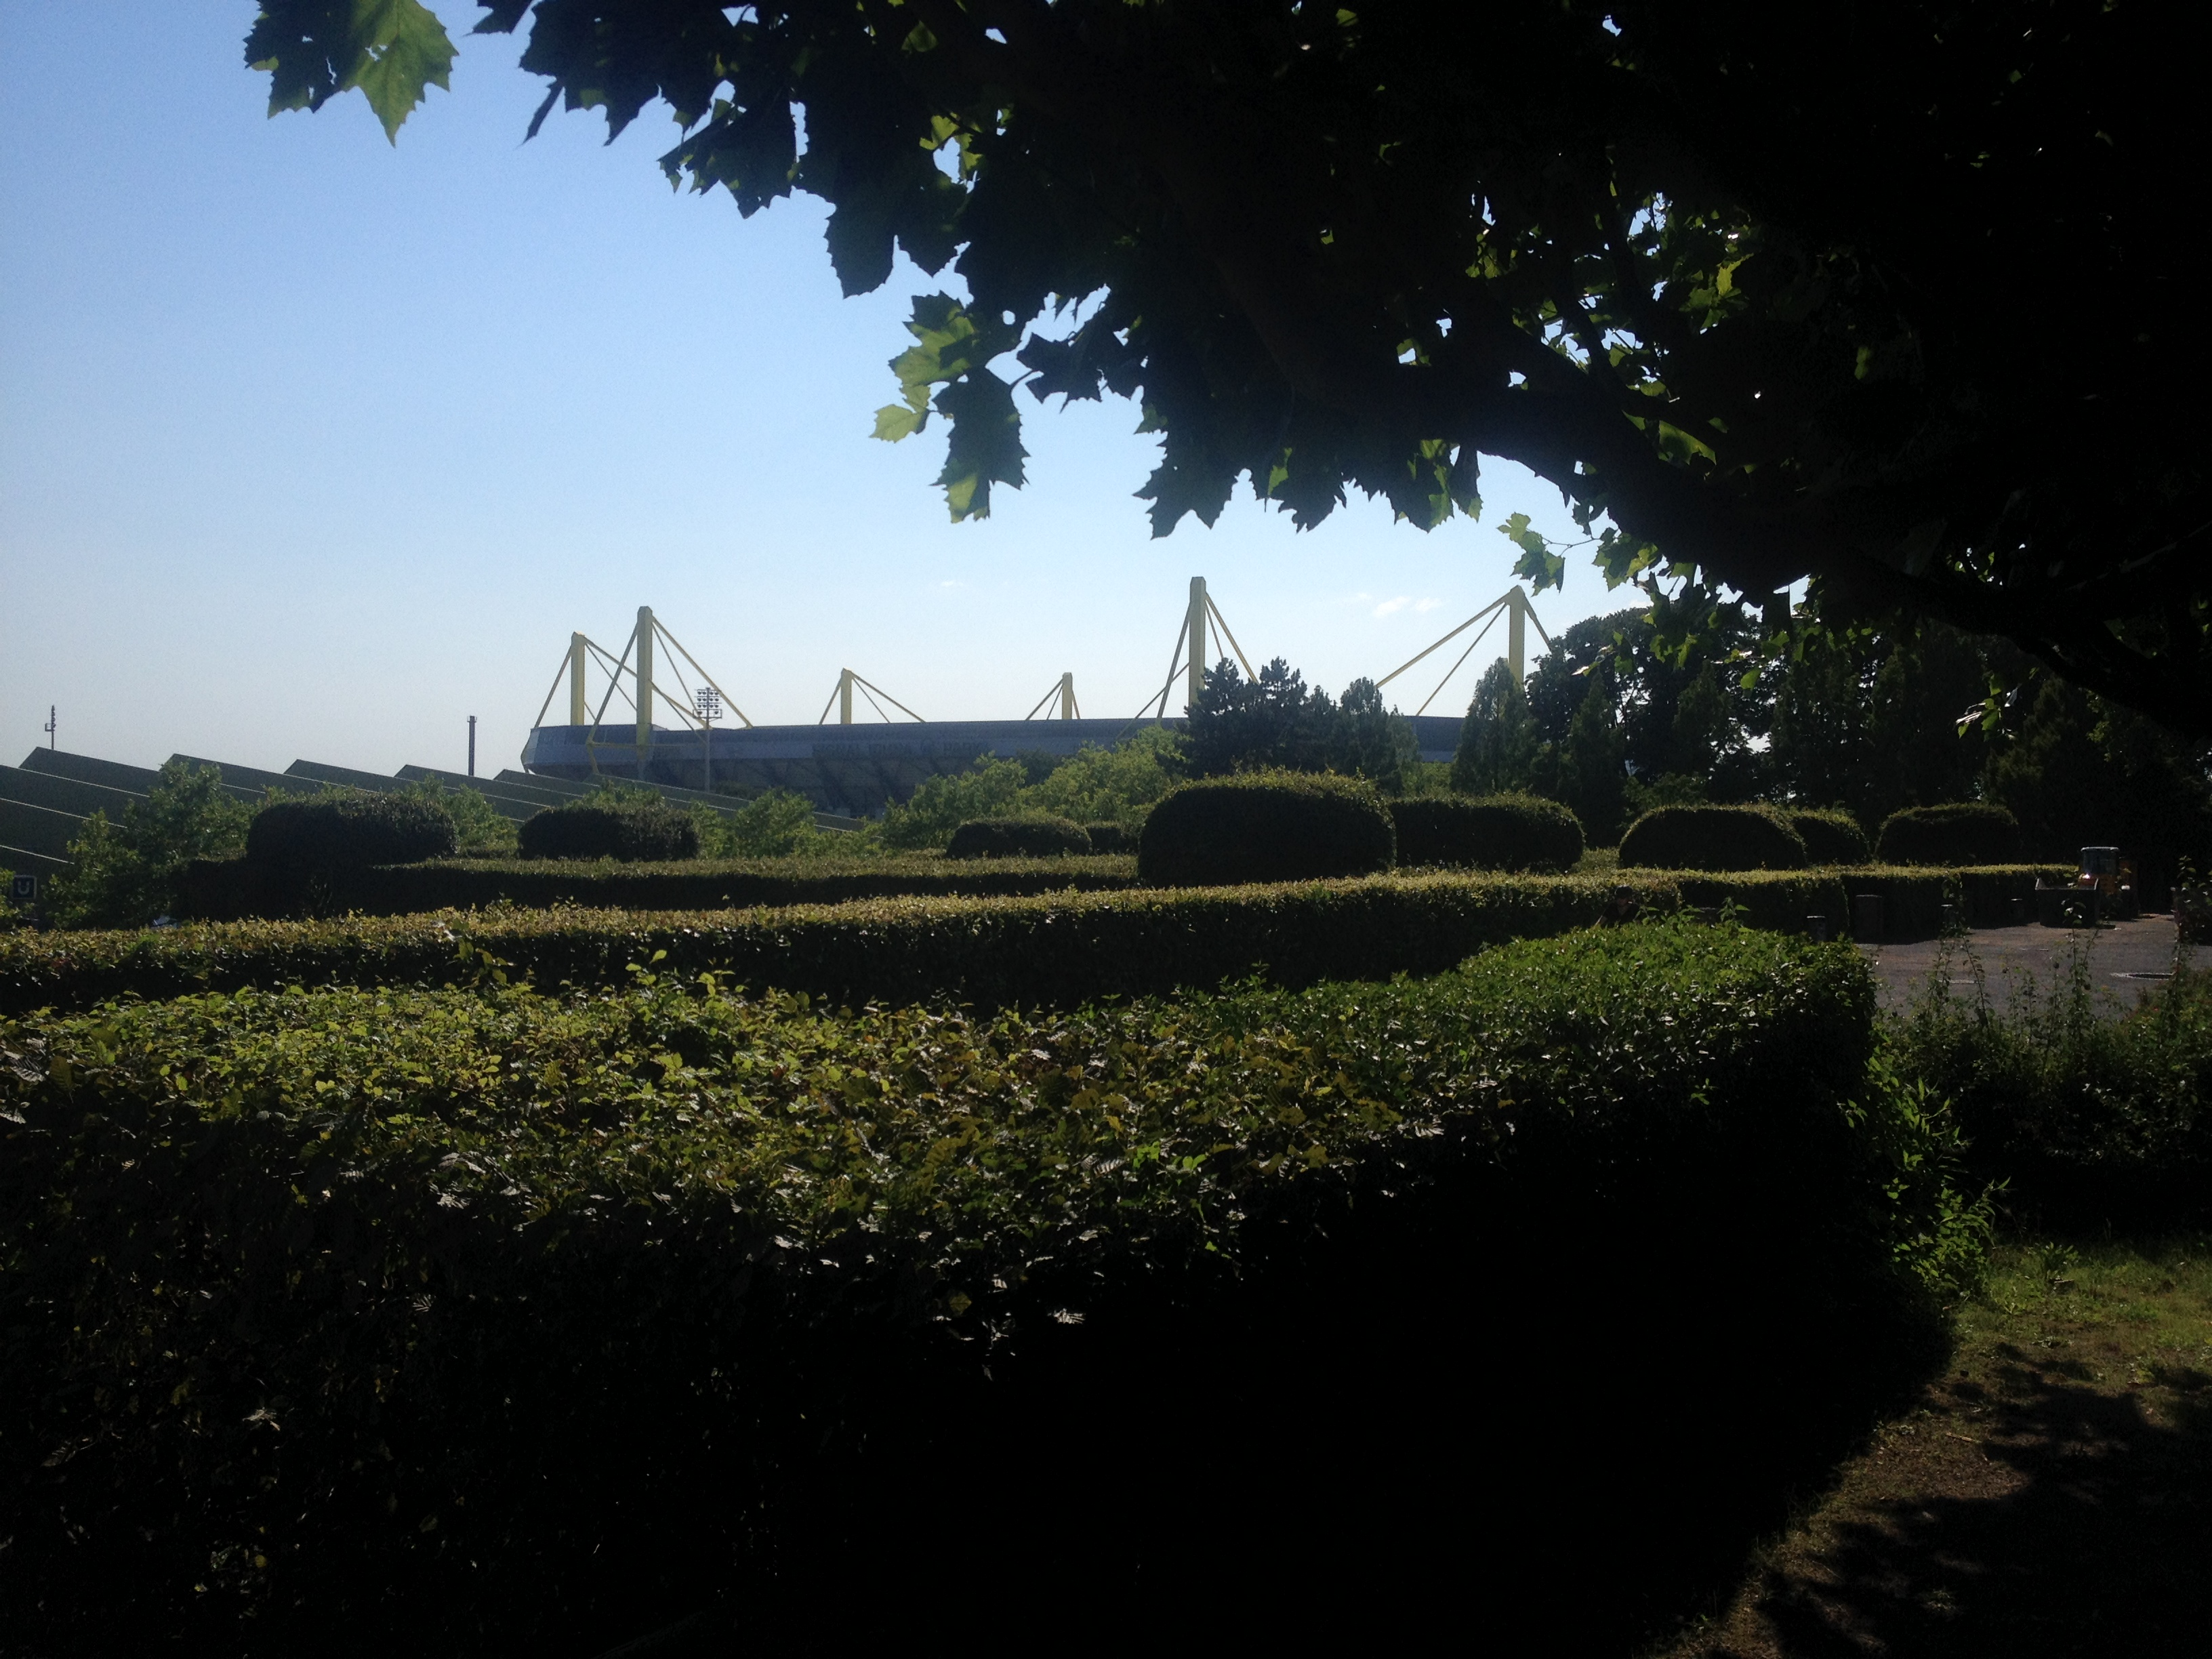 Ruhrgebied 022 - Dortmund